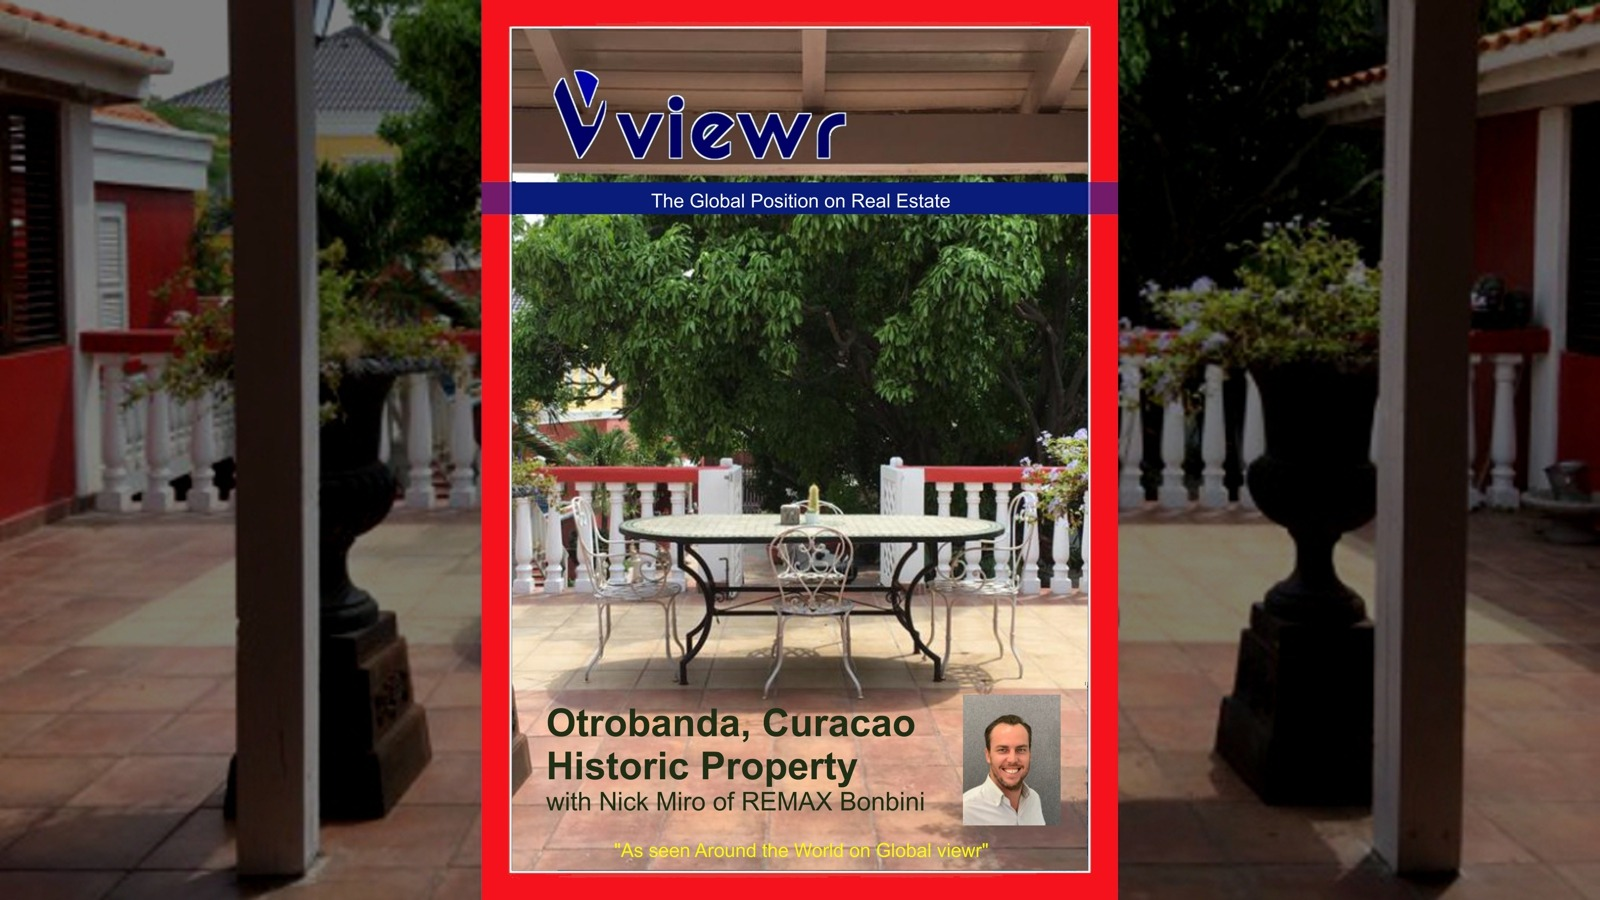 Global viewr Magazine Nick Miro Otrobanda Historic Property REMAX Bonbini Curacao